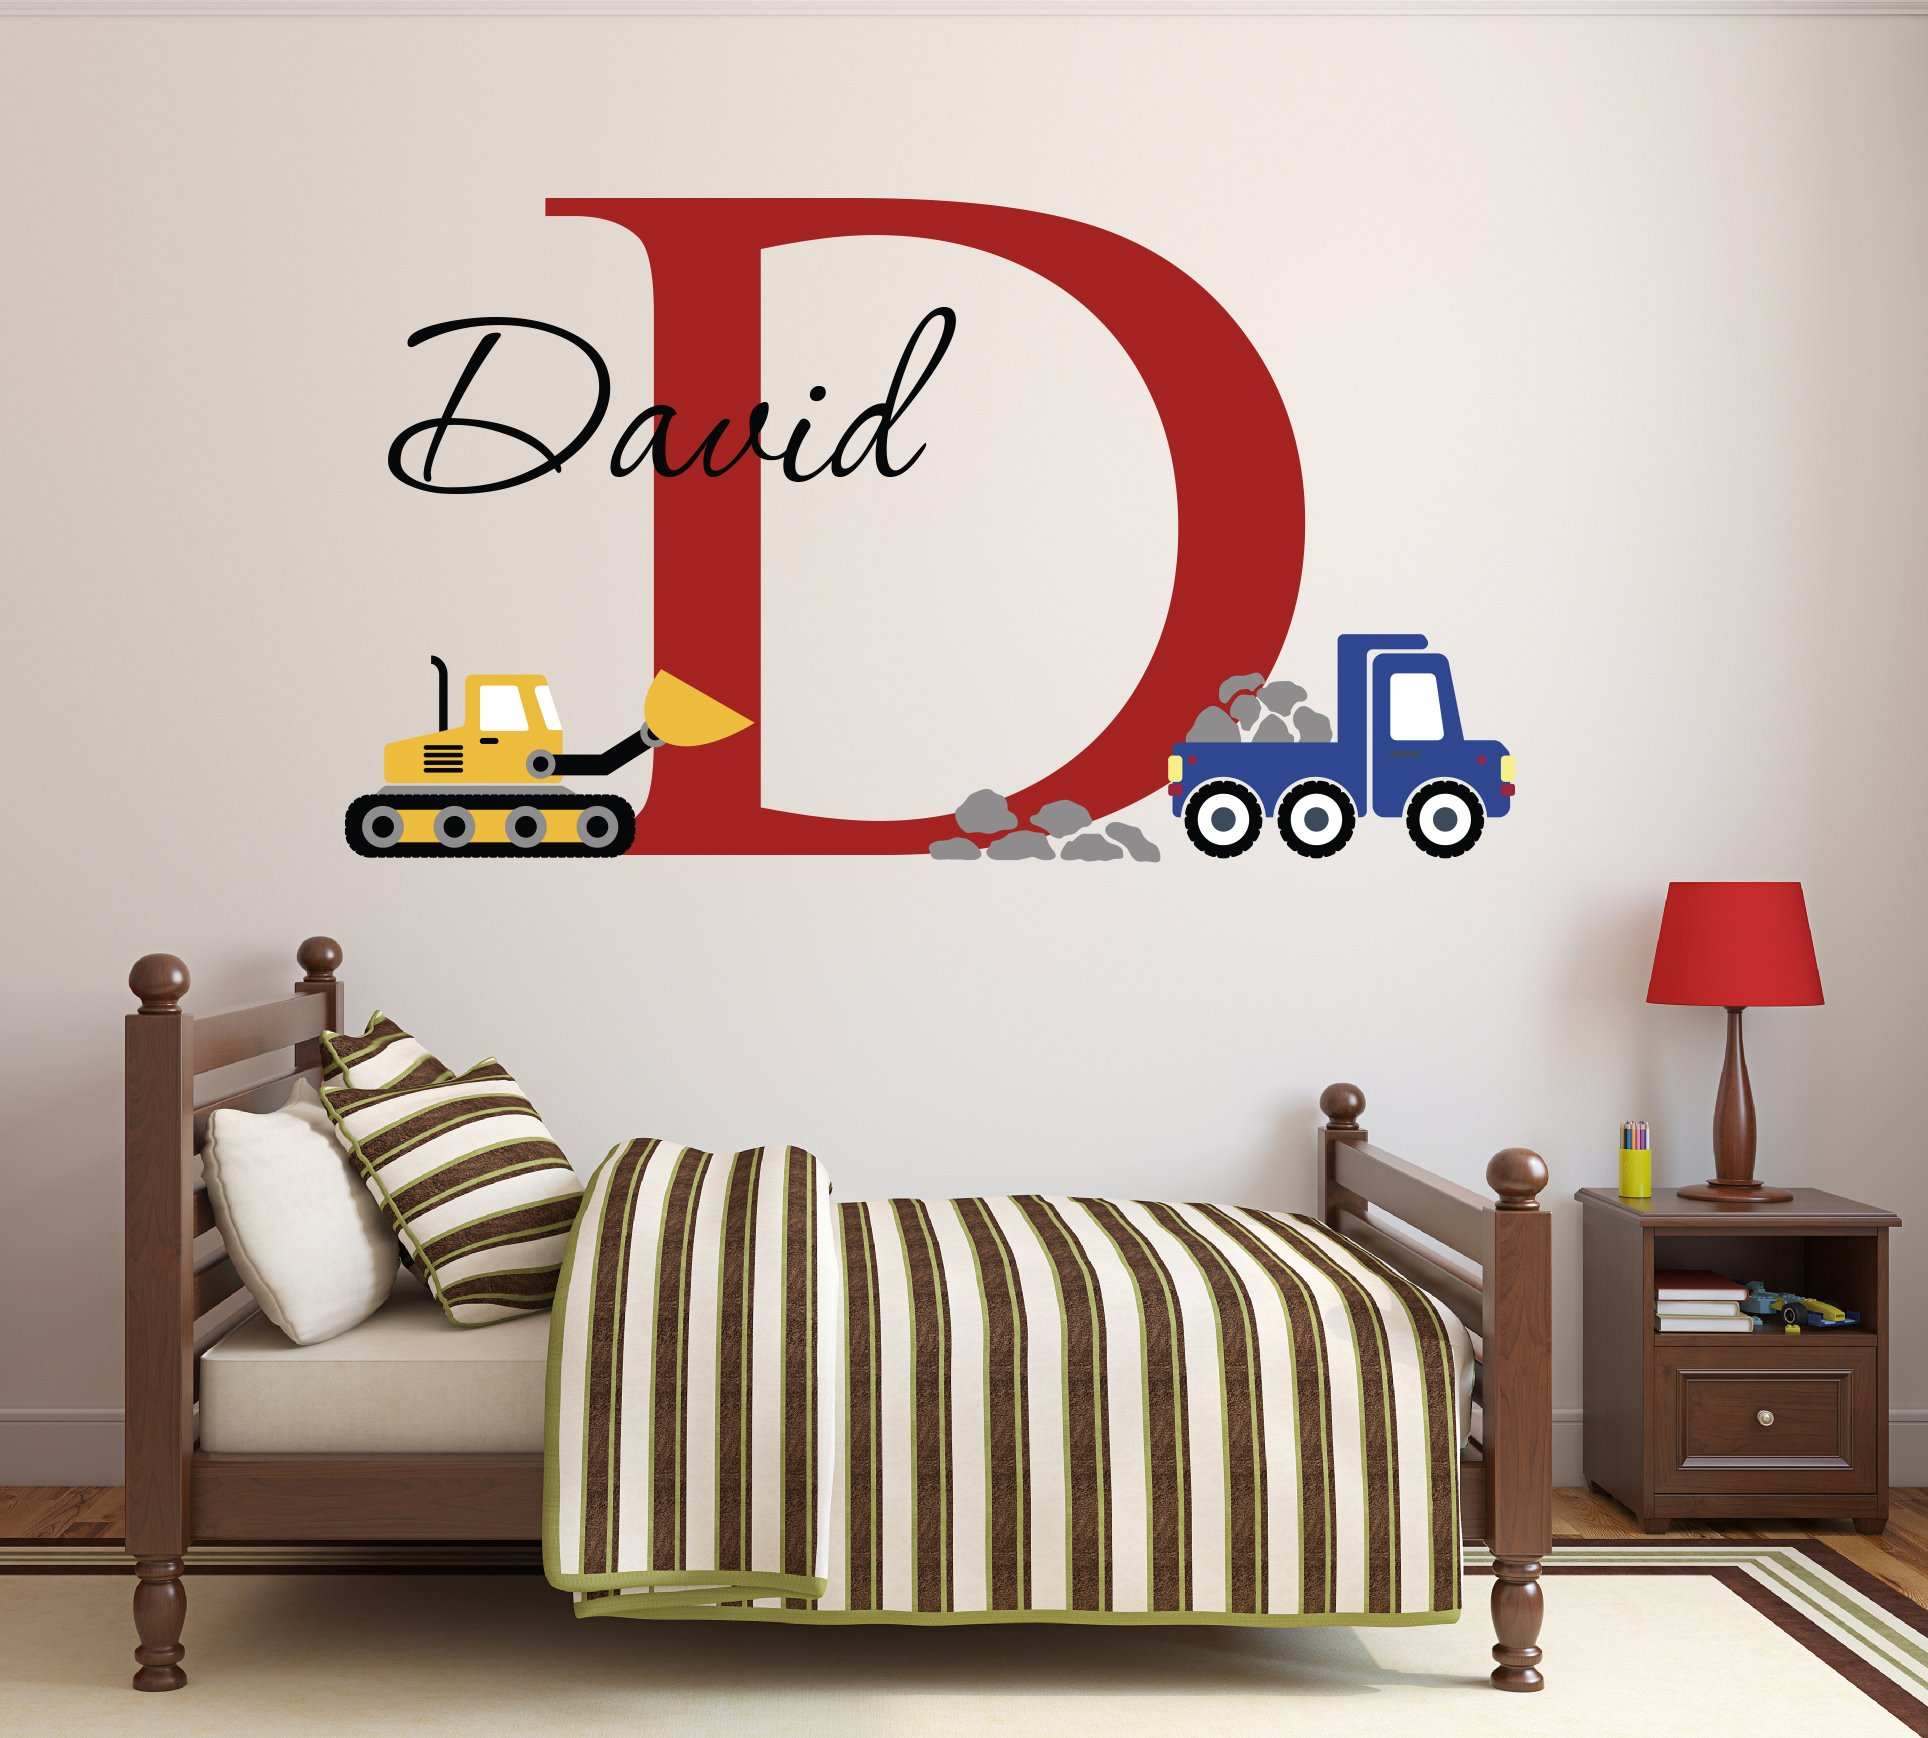 Custom Construction Truck Name Wall Decal for Boys Nursery Baby Room Art Decor Vinyl Sticker (20''W x 16''H)